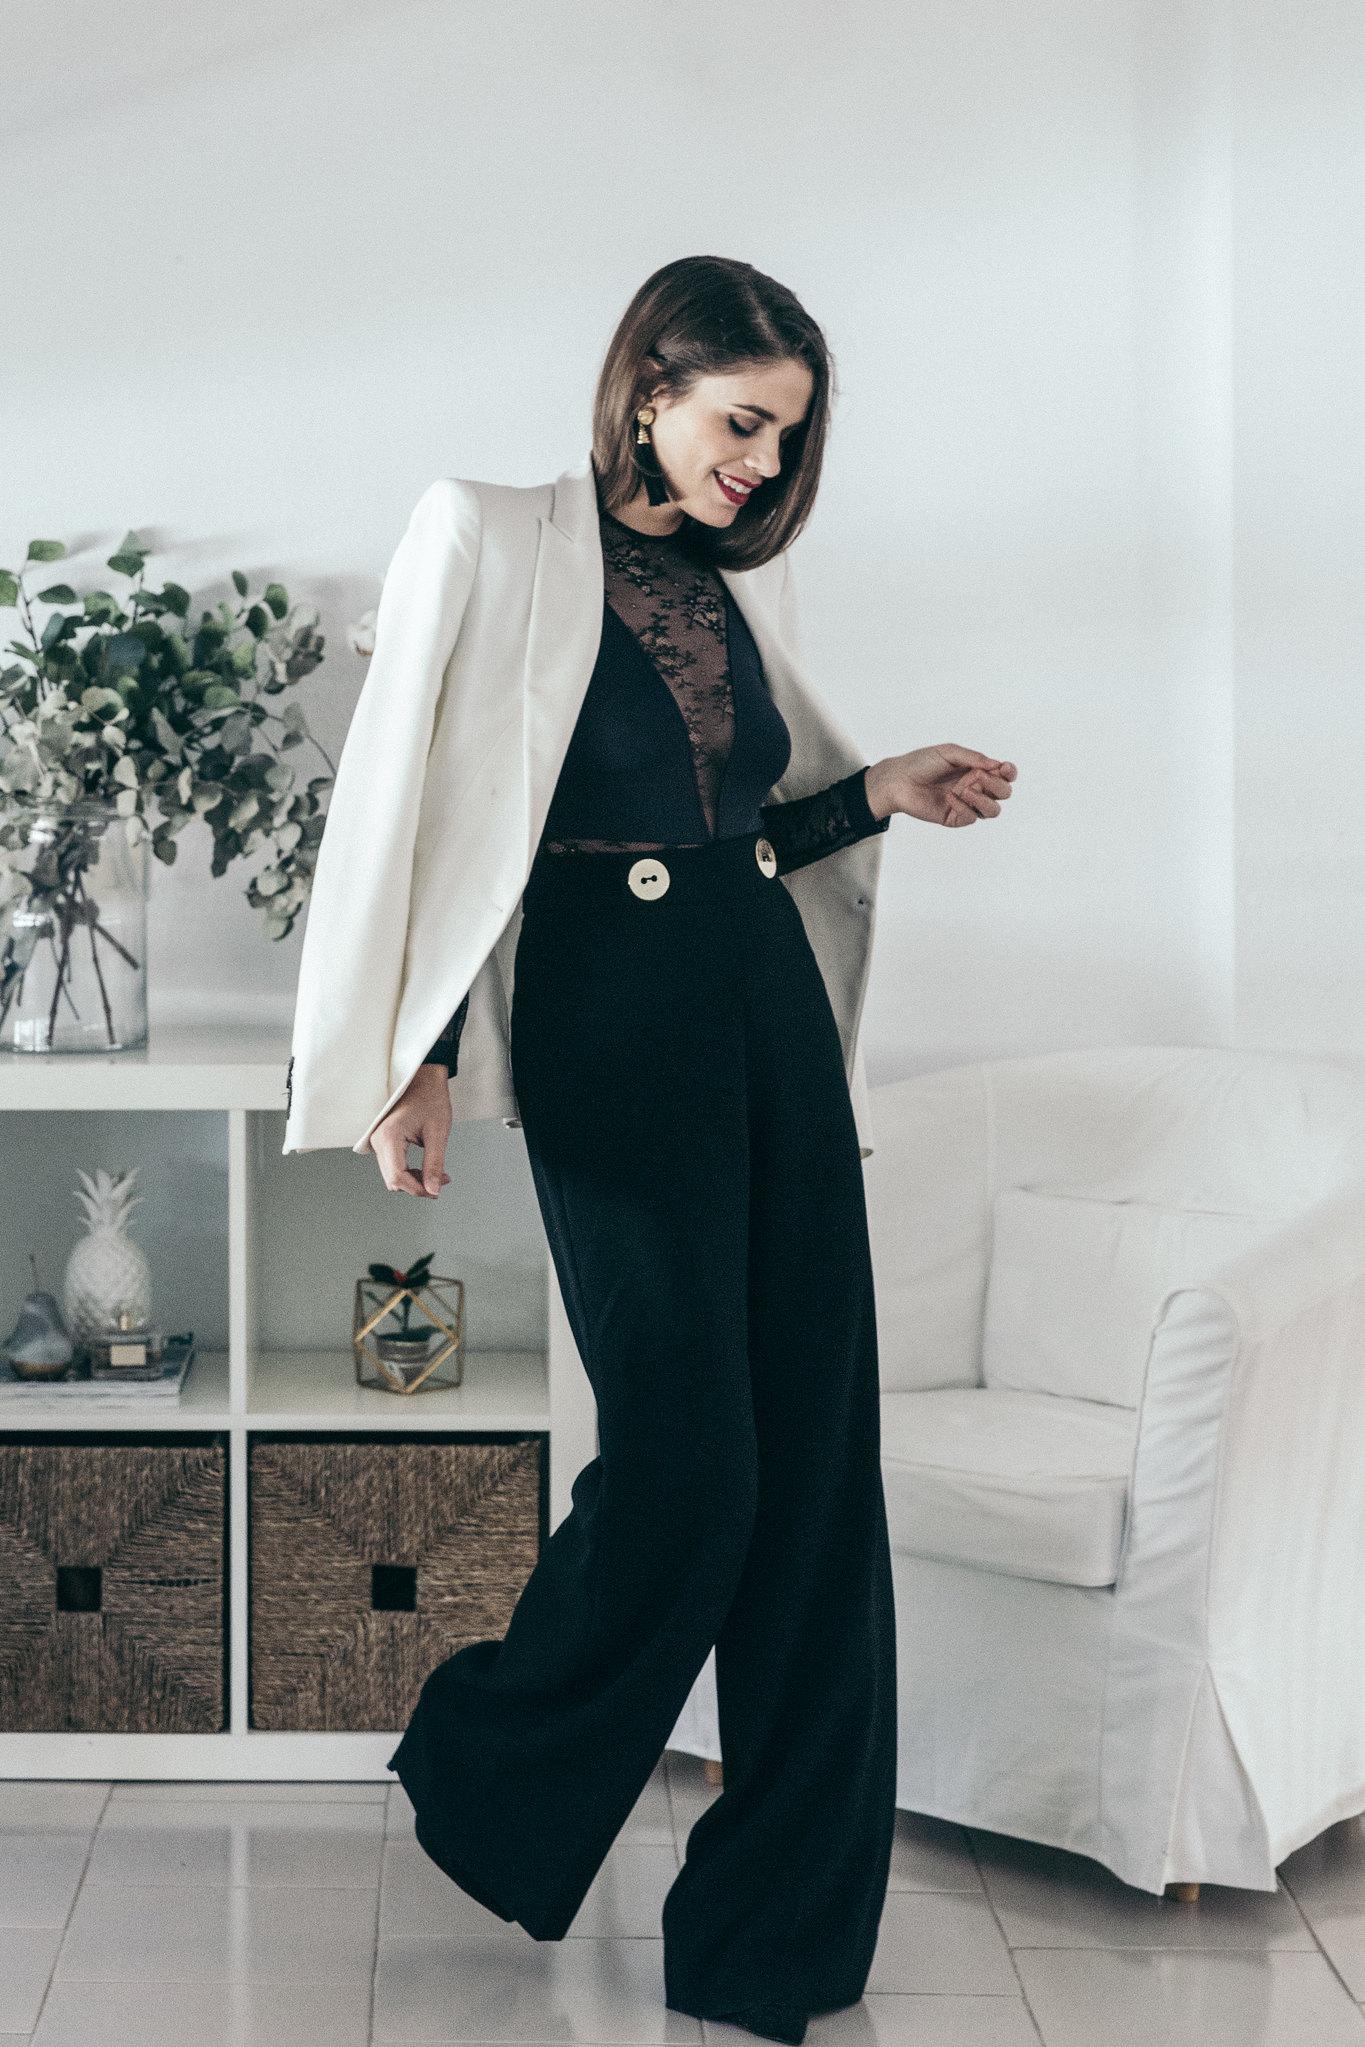 Jessie Chanes - Seams for a desire - WS - Women'secret -24